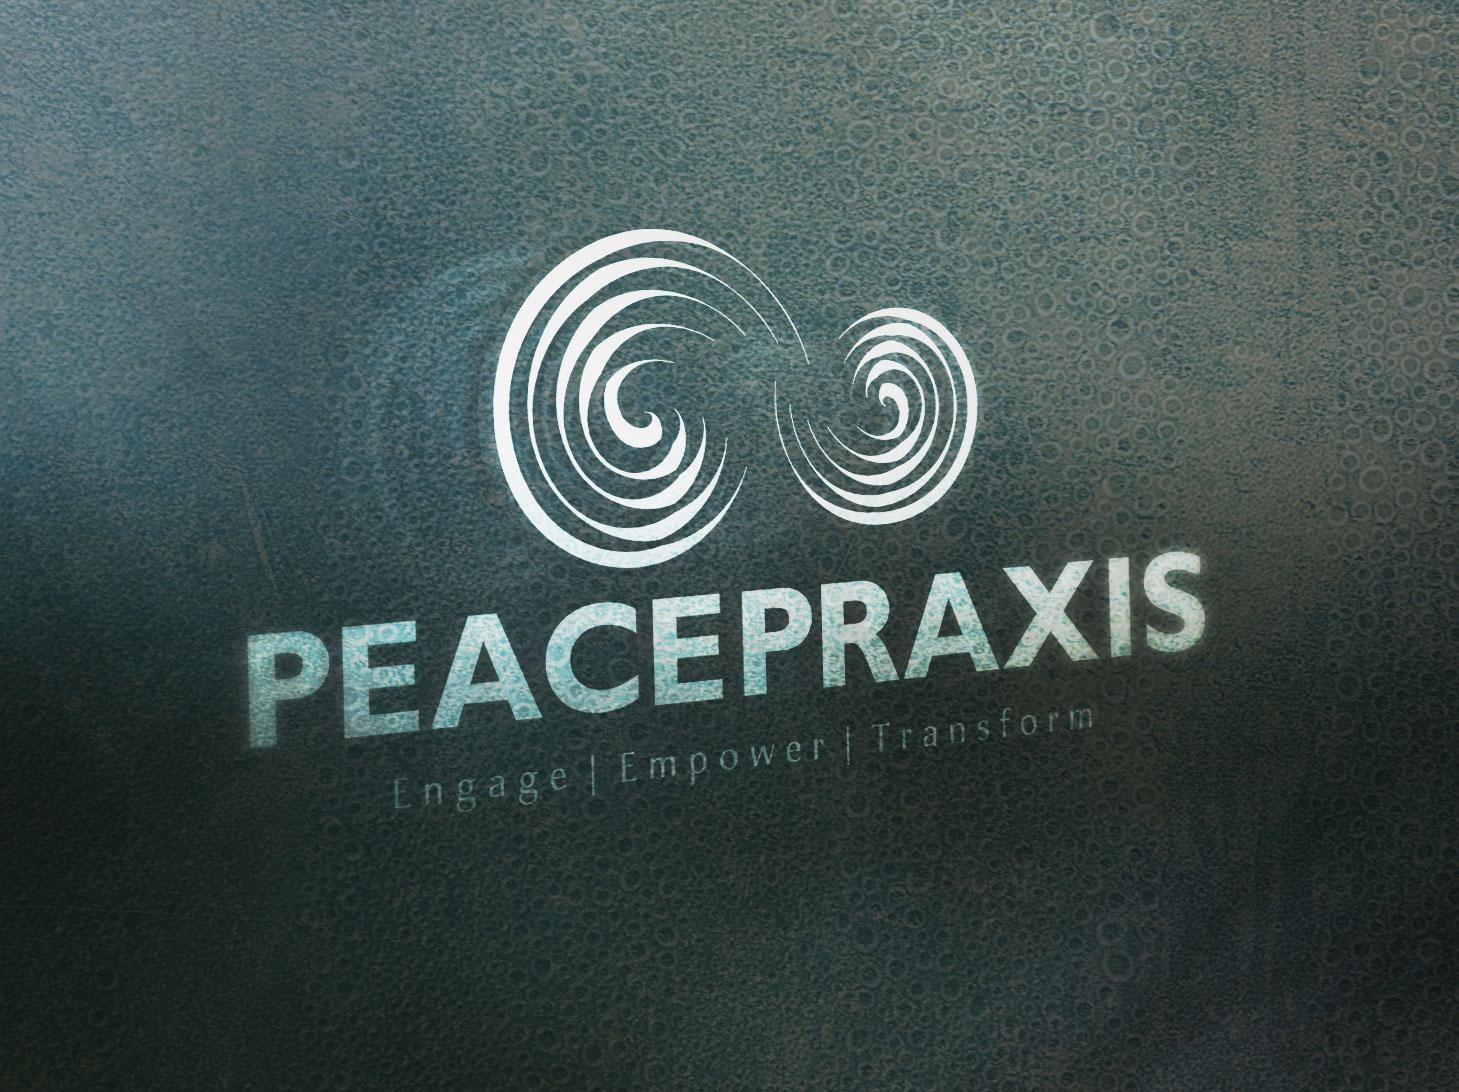 peacepraxis.jpg